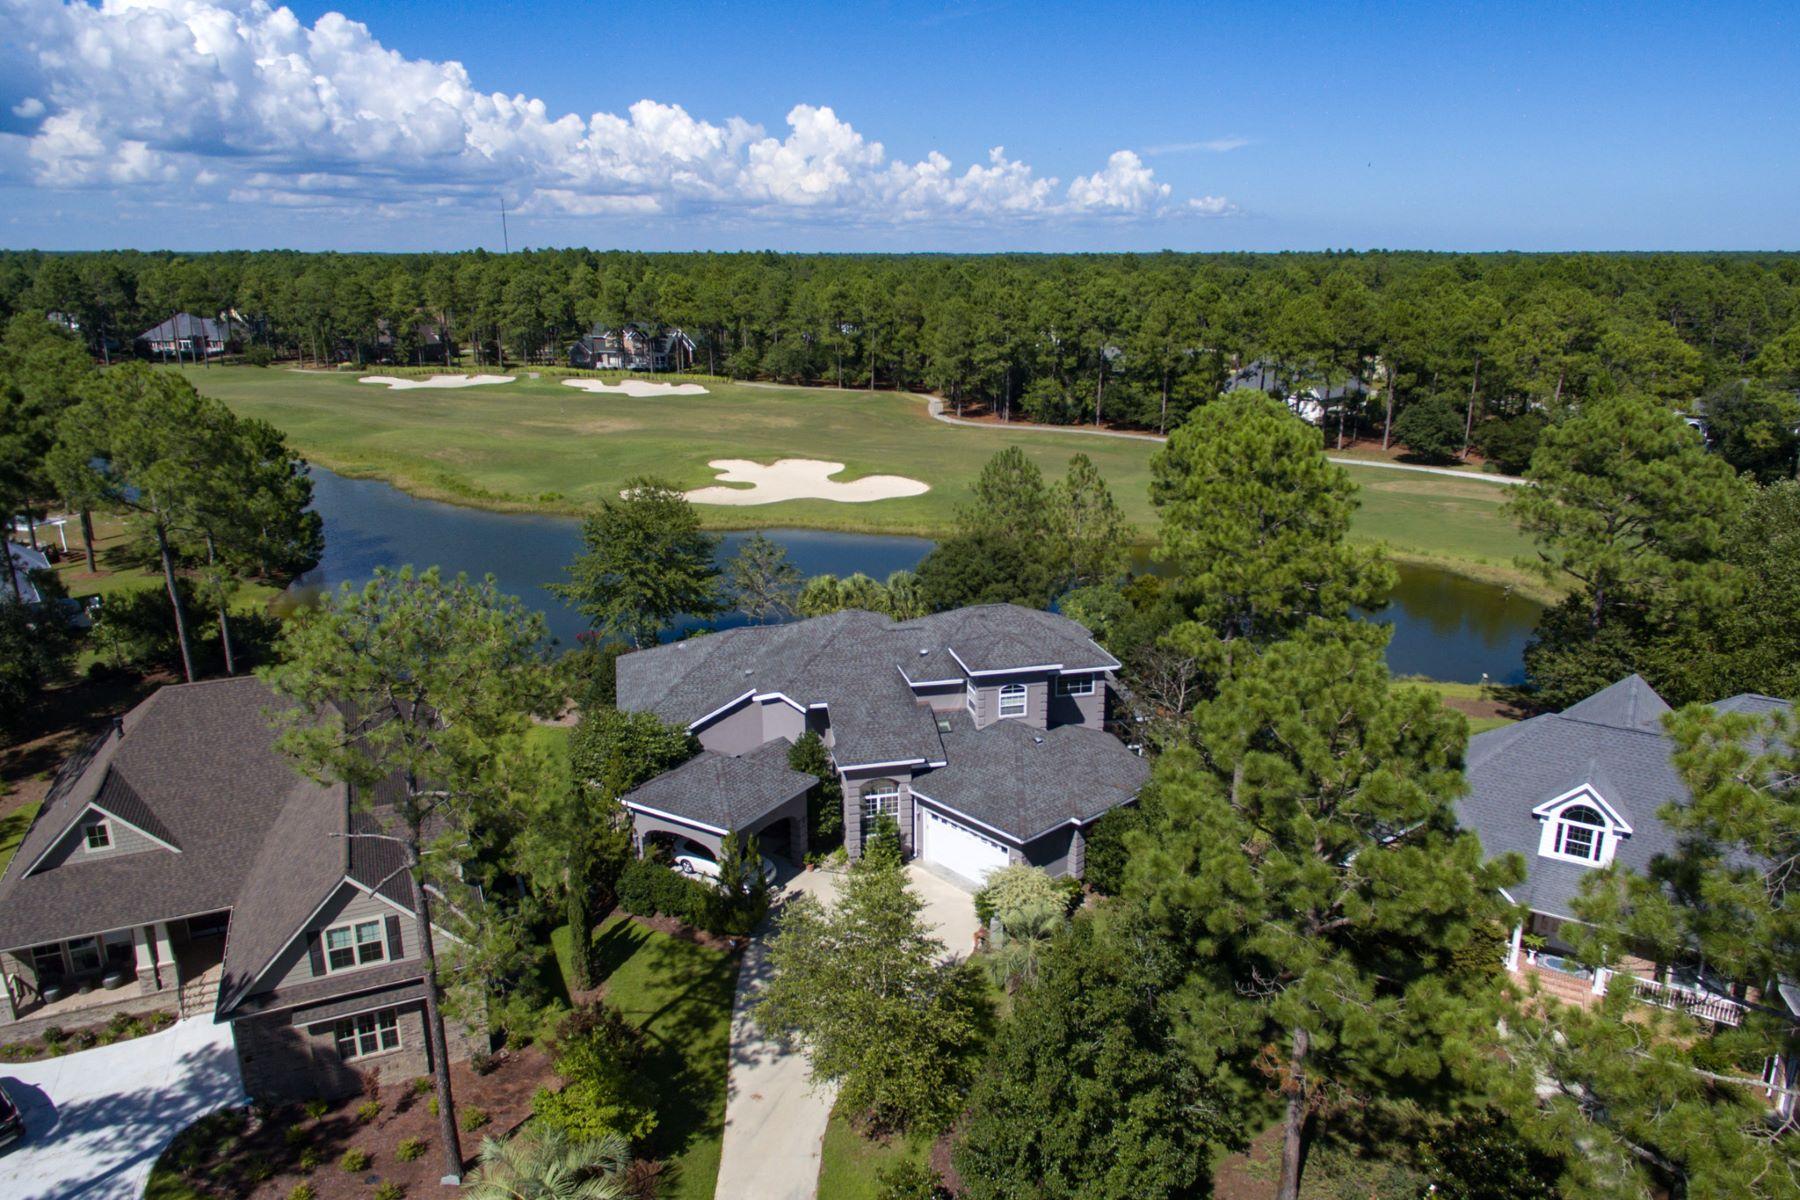 Single Family Home for Sale at Harmonious Hidden Masterpiece 1734 Merriweather Lane SE Bolivia, North Carolina, 28422 United States